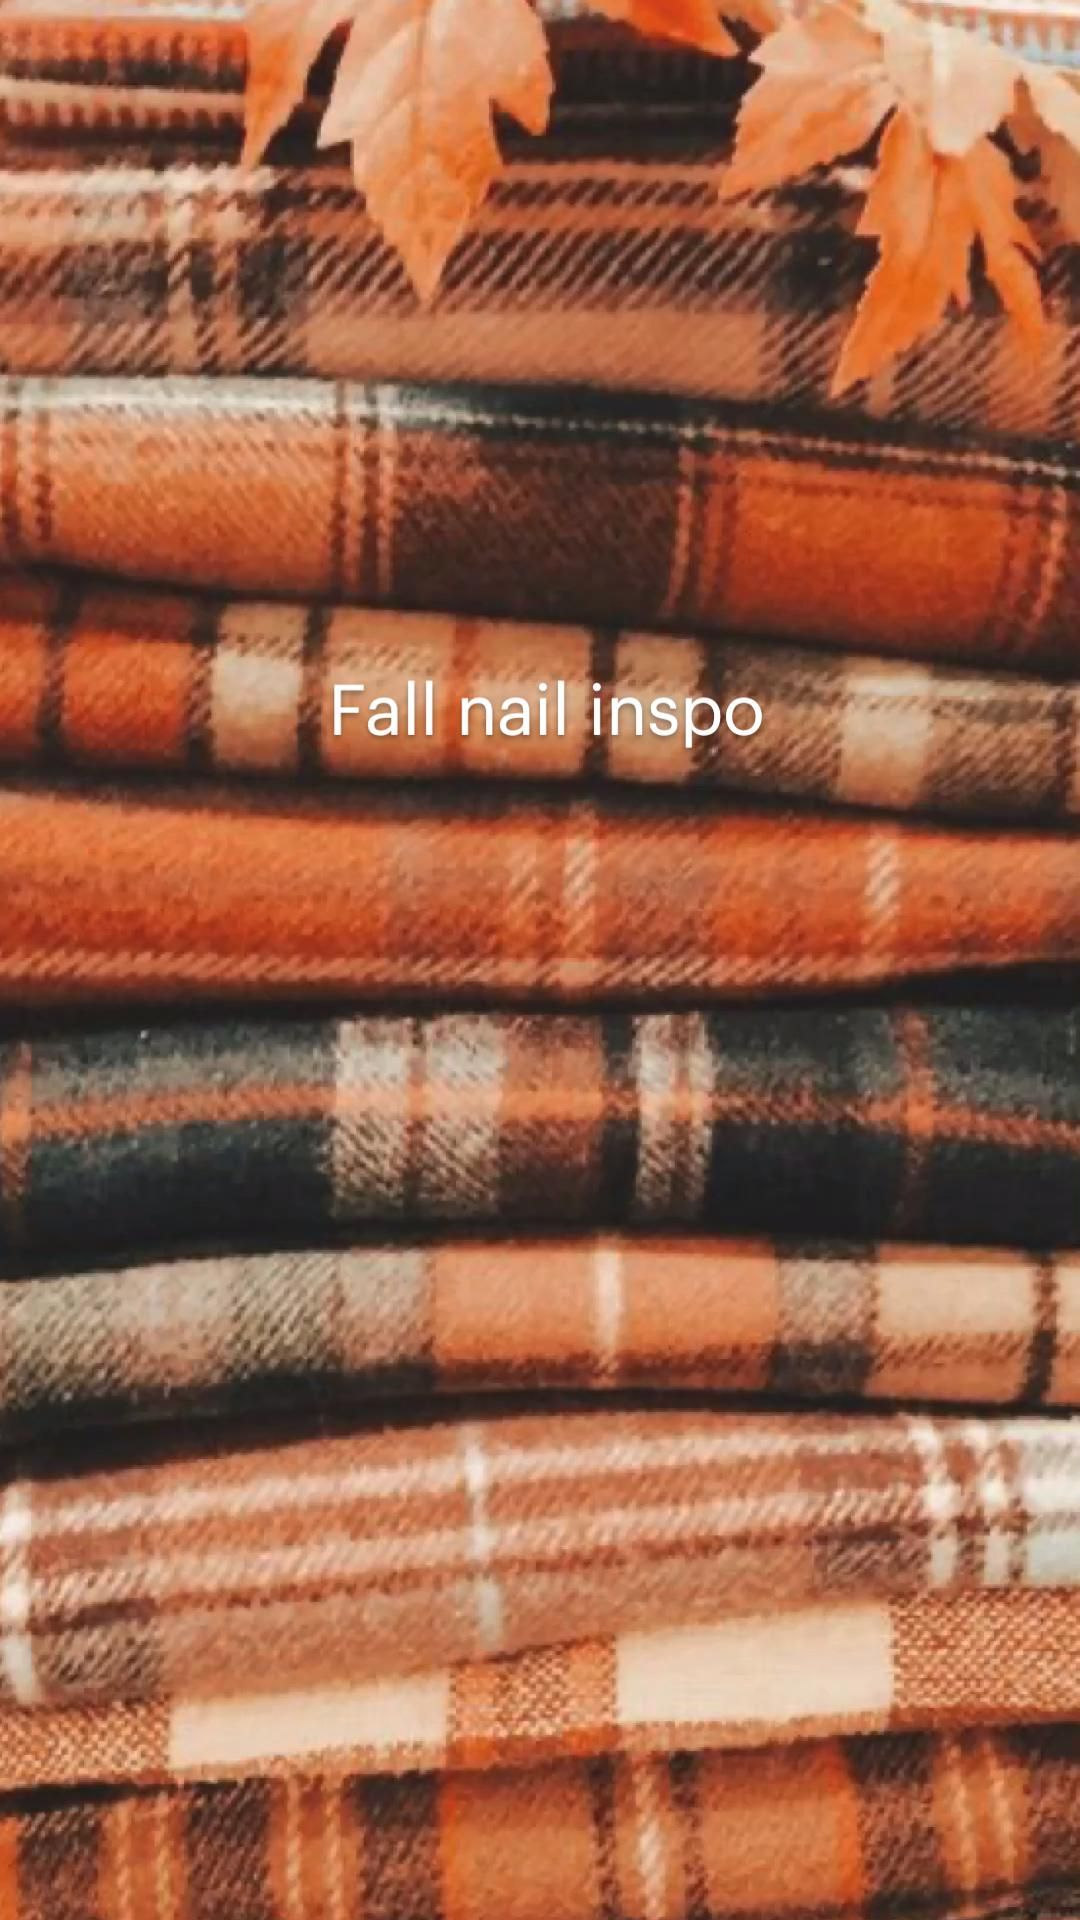 Fall nail inspo